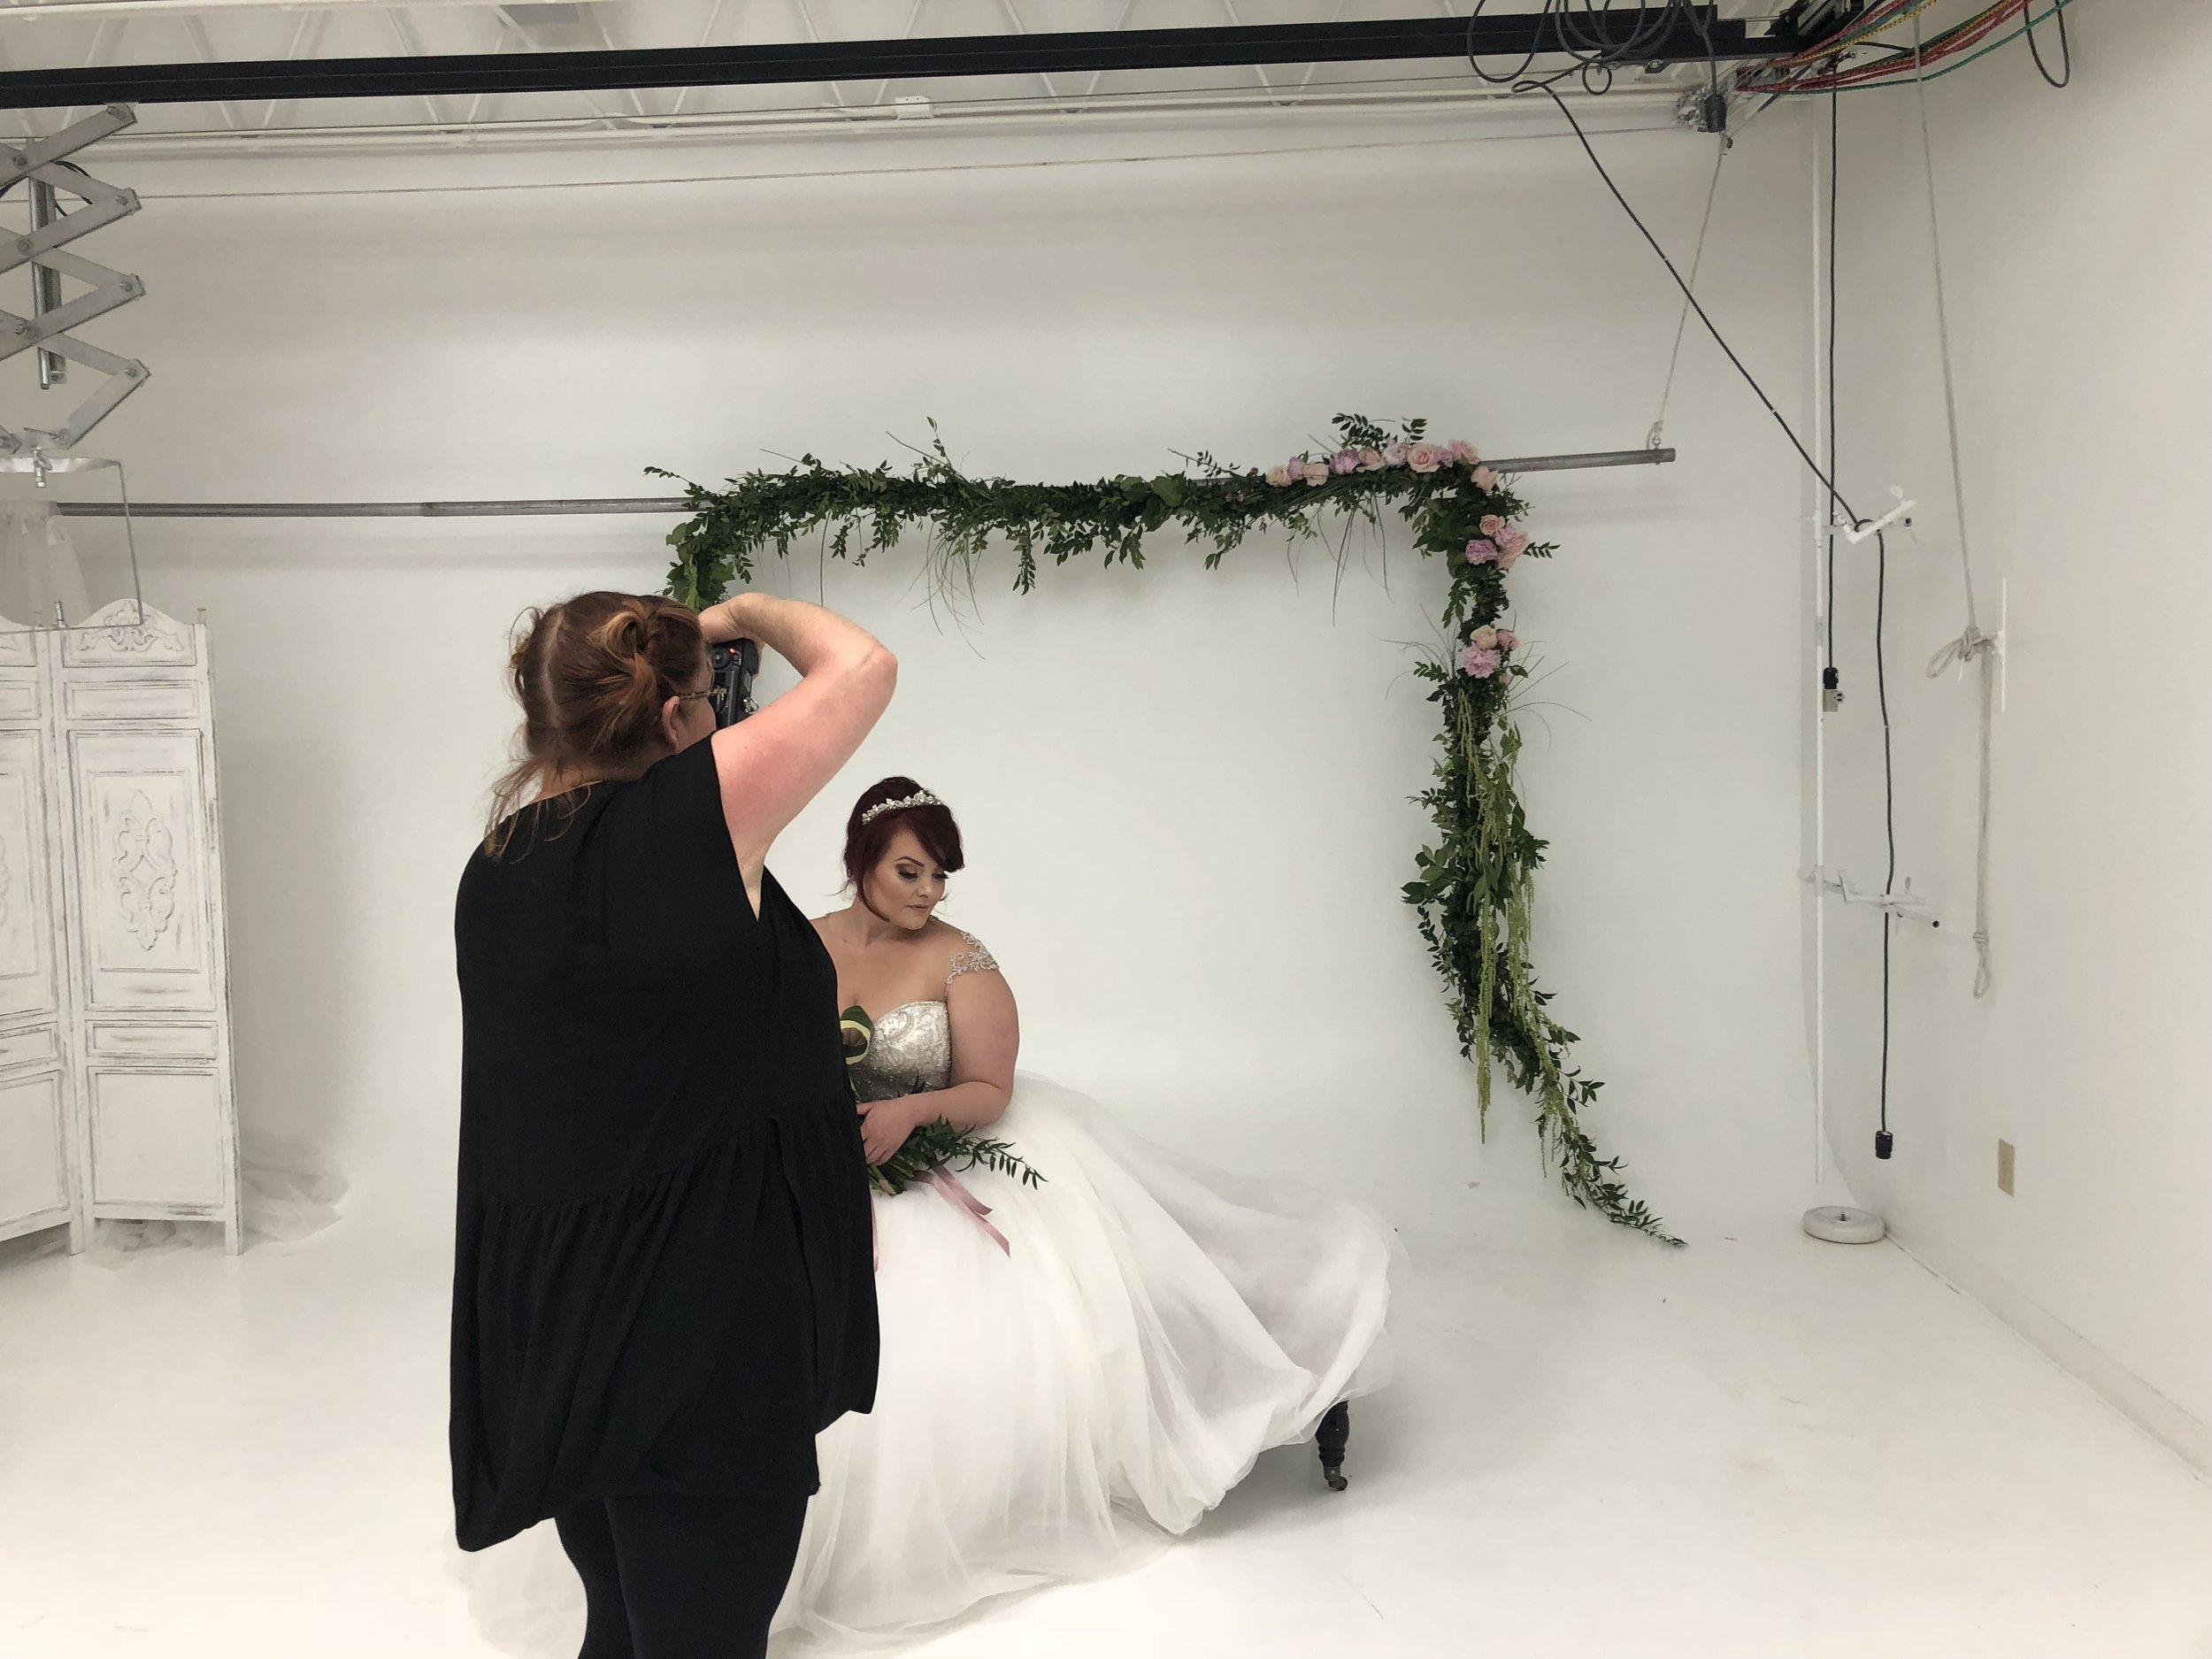 uptown Bride fashion shoot 2.jpg